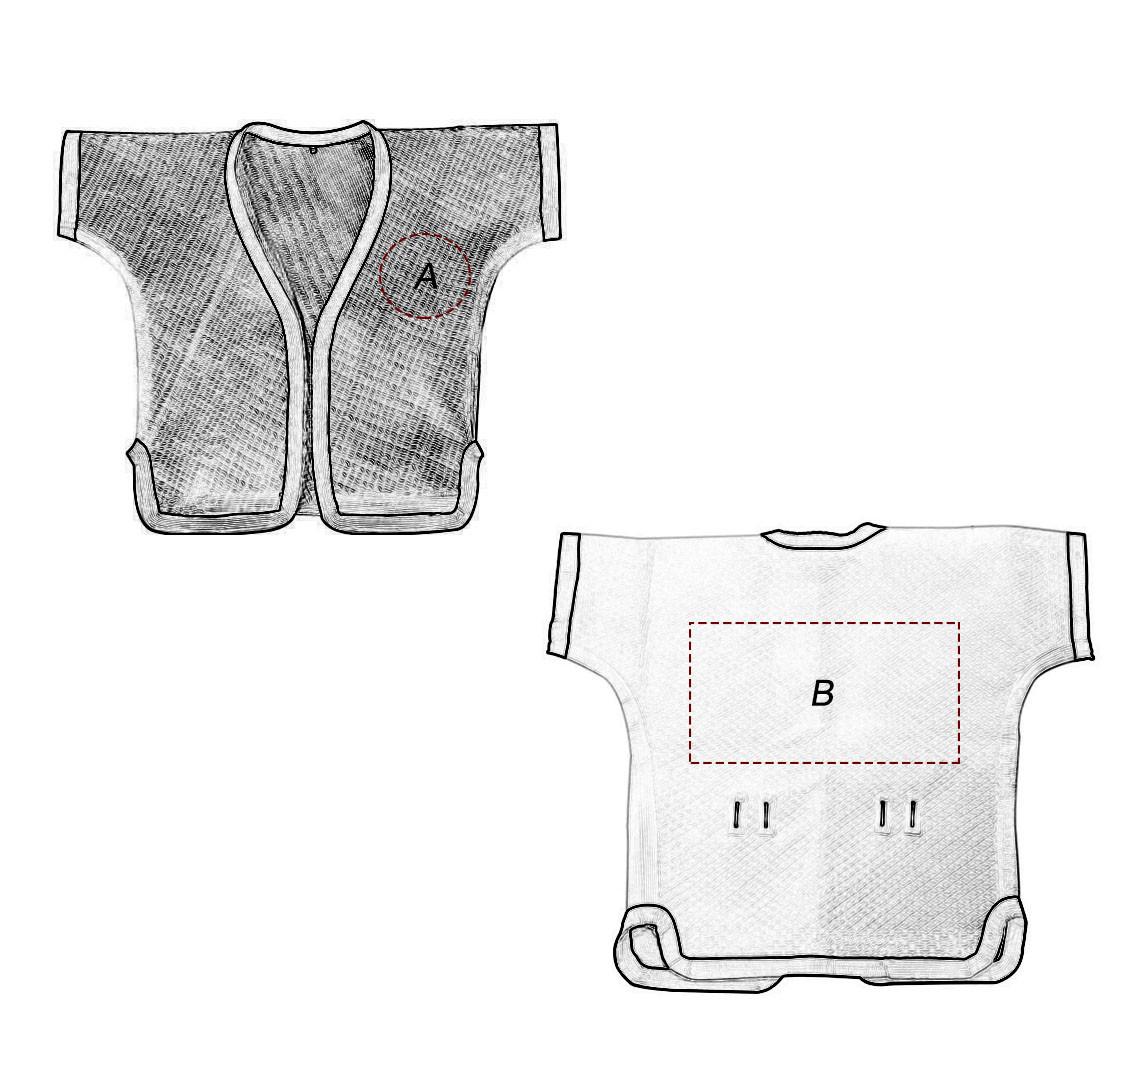 Printed LOGO Service for Shuai Jiao jacket